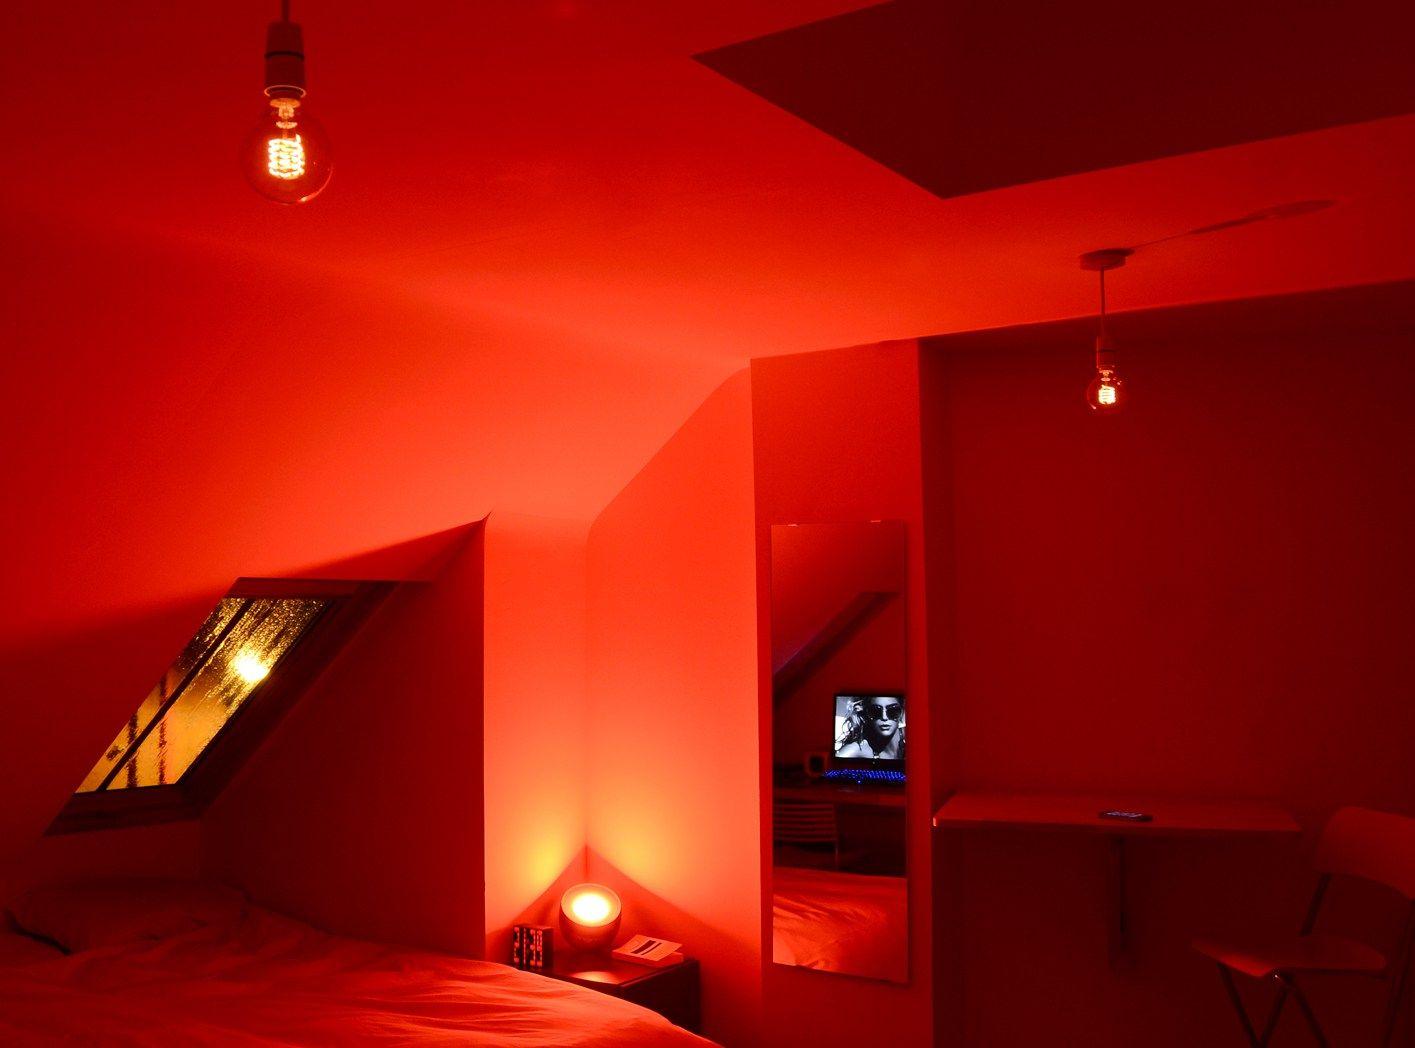 Http Nasro Me Image Red Light Bedroom Red Light Bedroom Sleep Improving Tip Sleeping Insomnium R E M Red Light Bulbs Led Lighting Bedroom Colored Light Bulbs